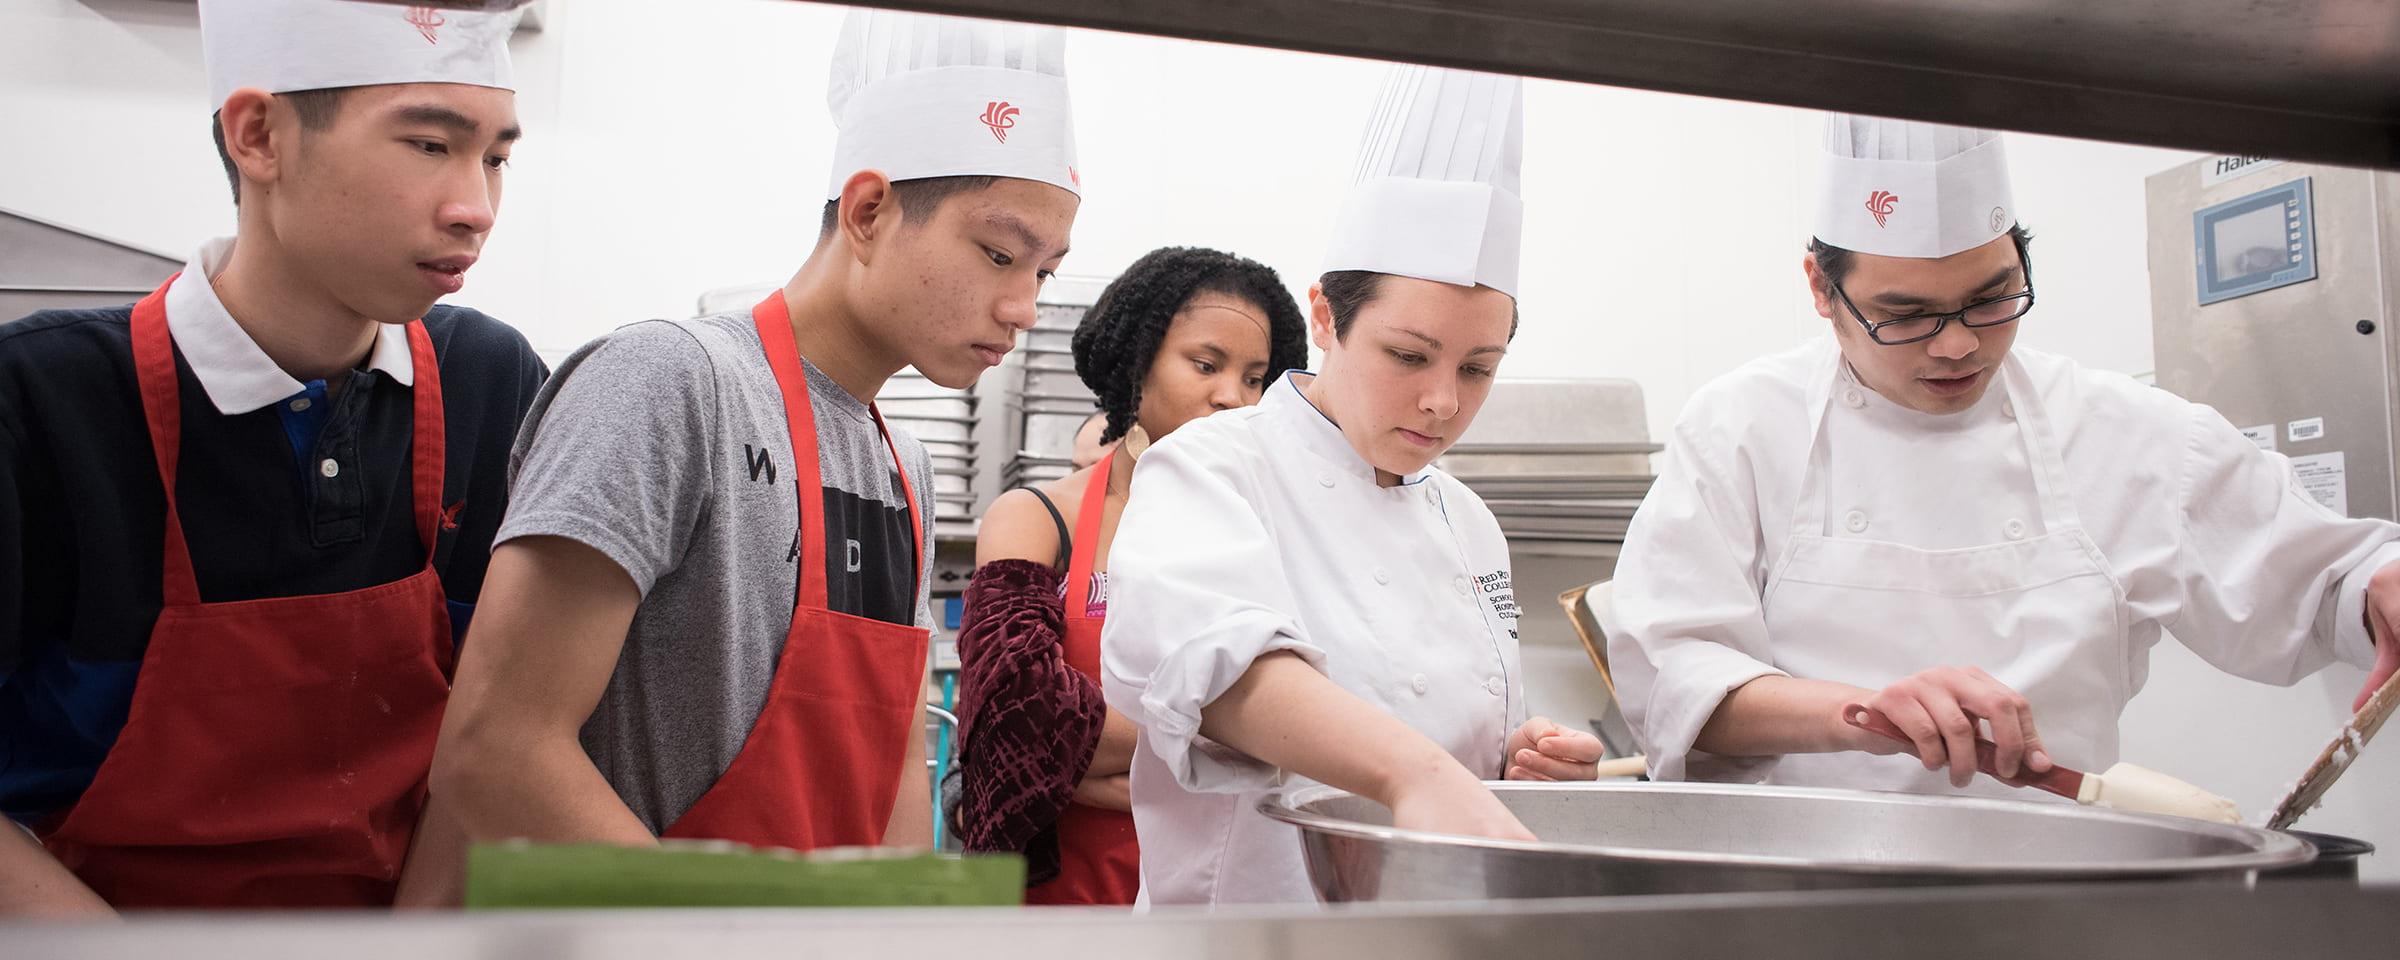 RRC After School Leaders – Culinary Arts program